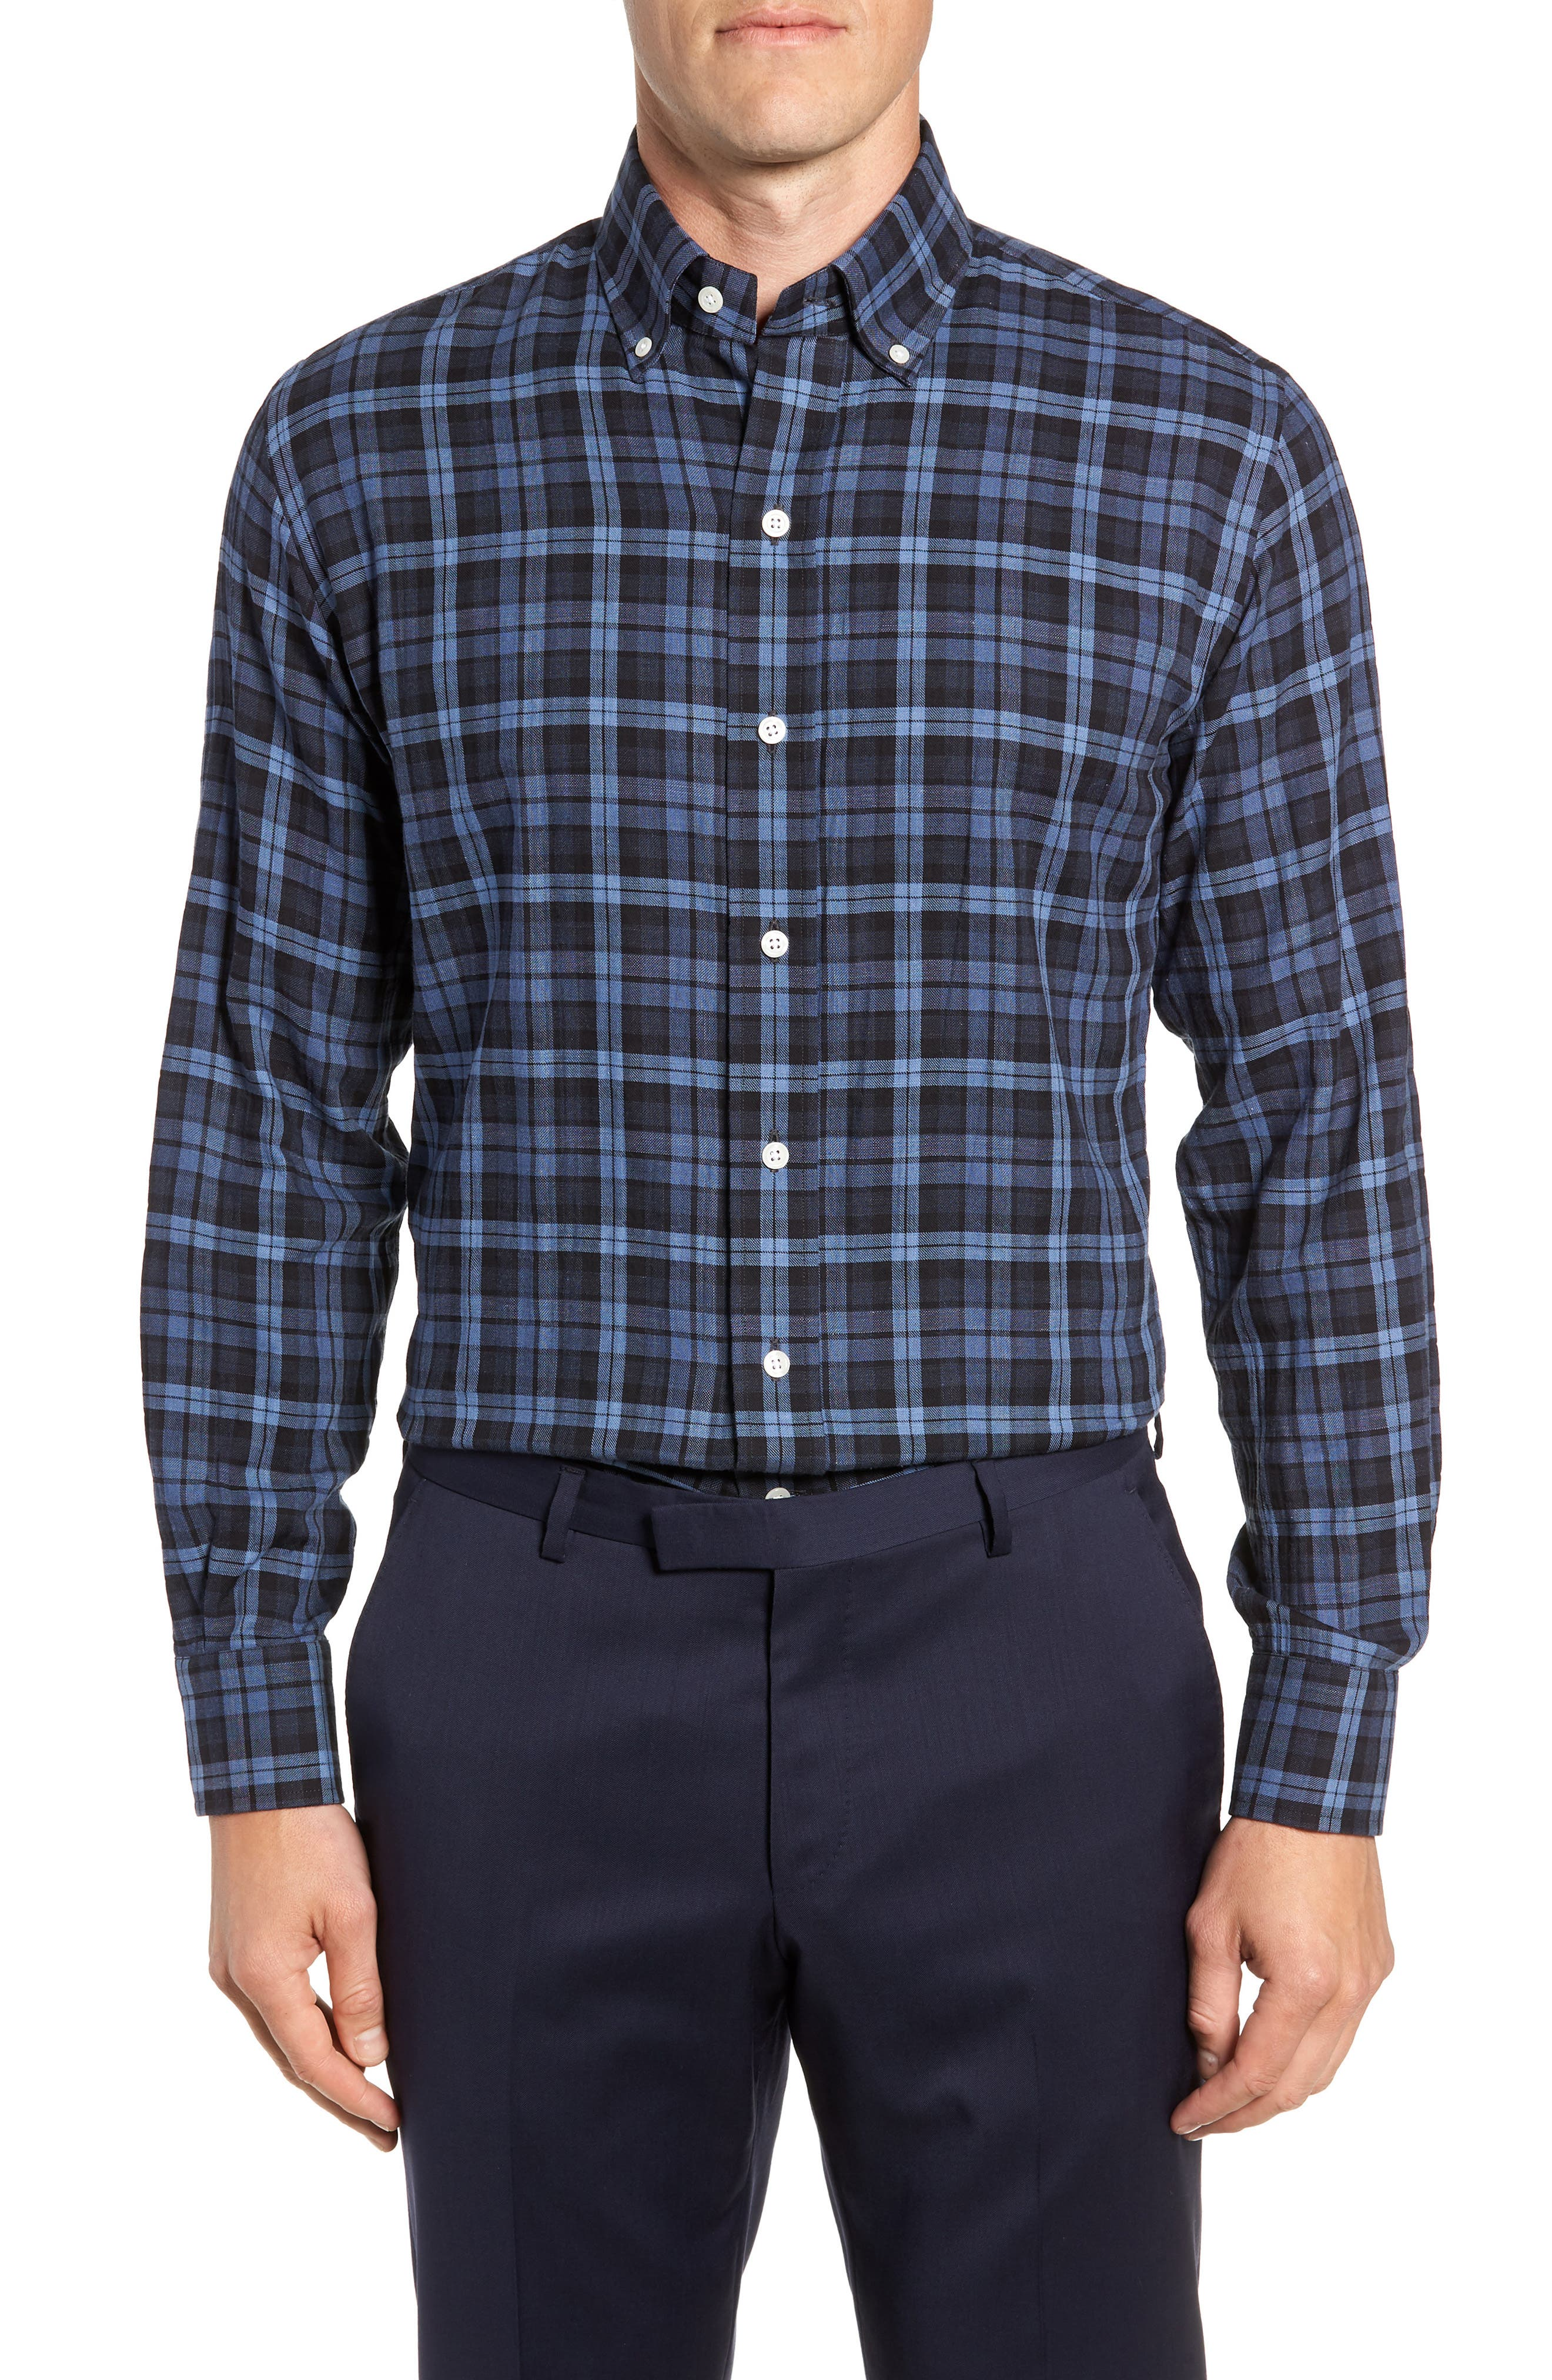 LEDBURY Torello Trim Fit Plaid Dress Shirt in Navy